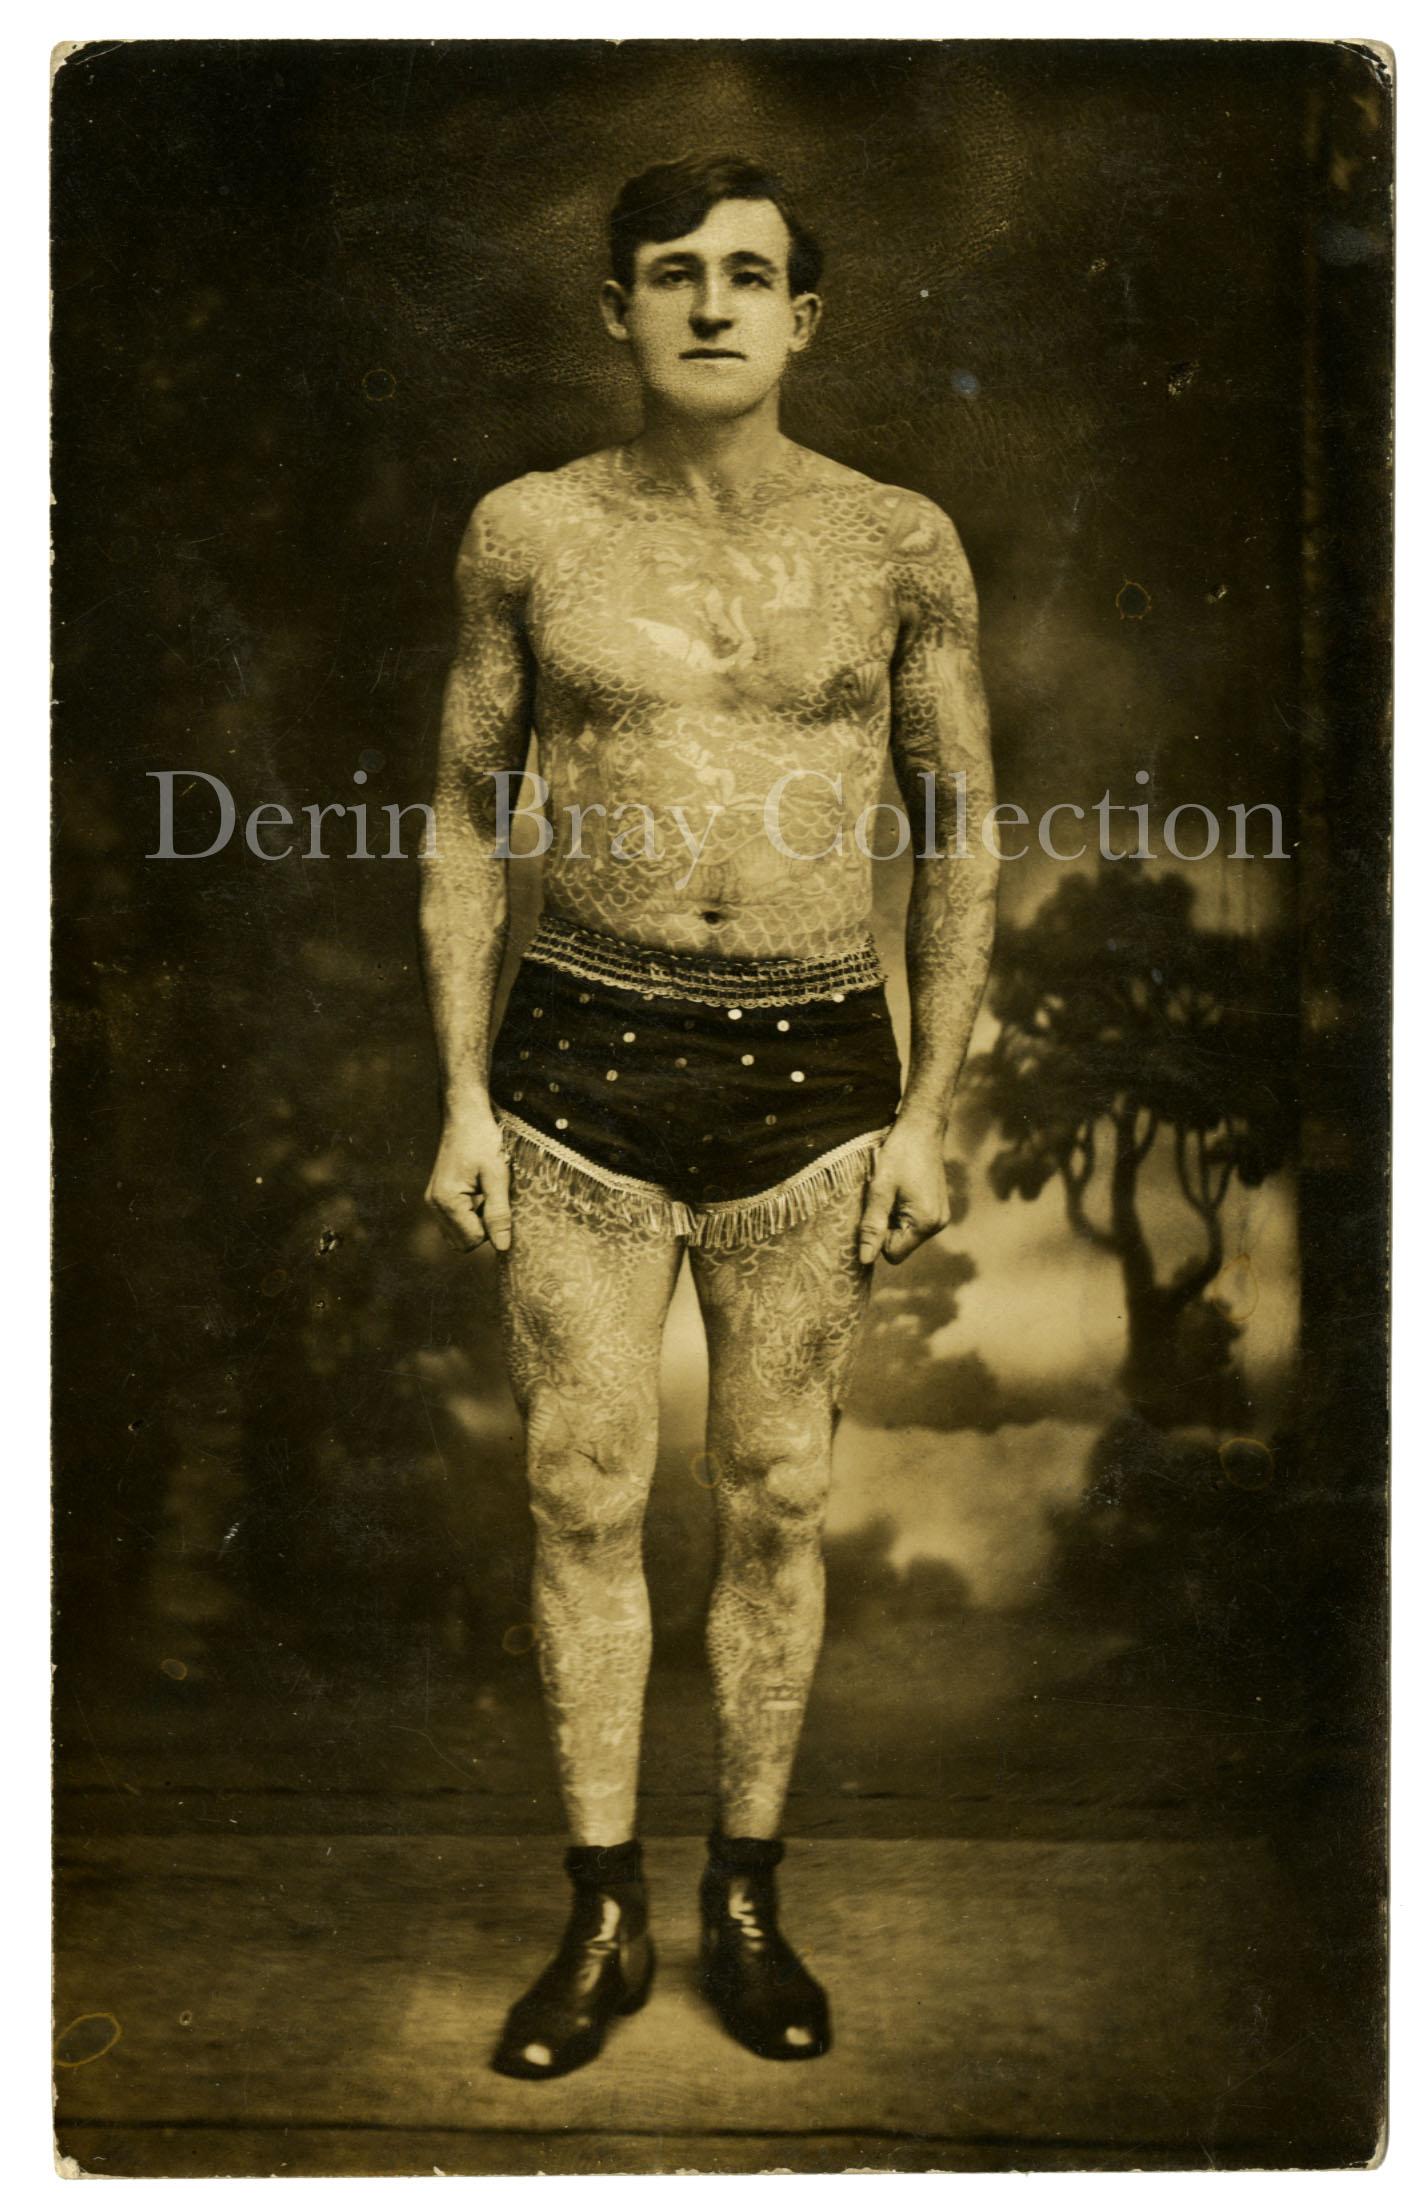 TattooedMan_Charlie_Wagner_Bowery_Derin_Bray.jpg